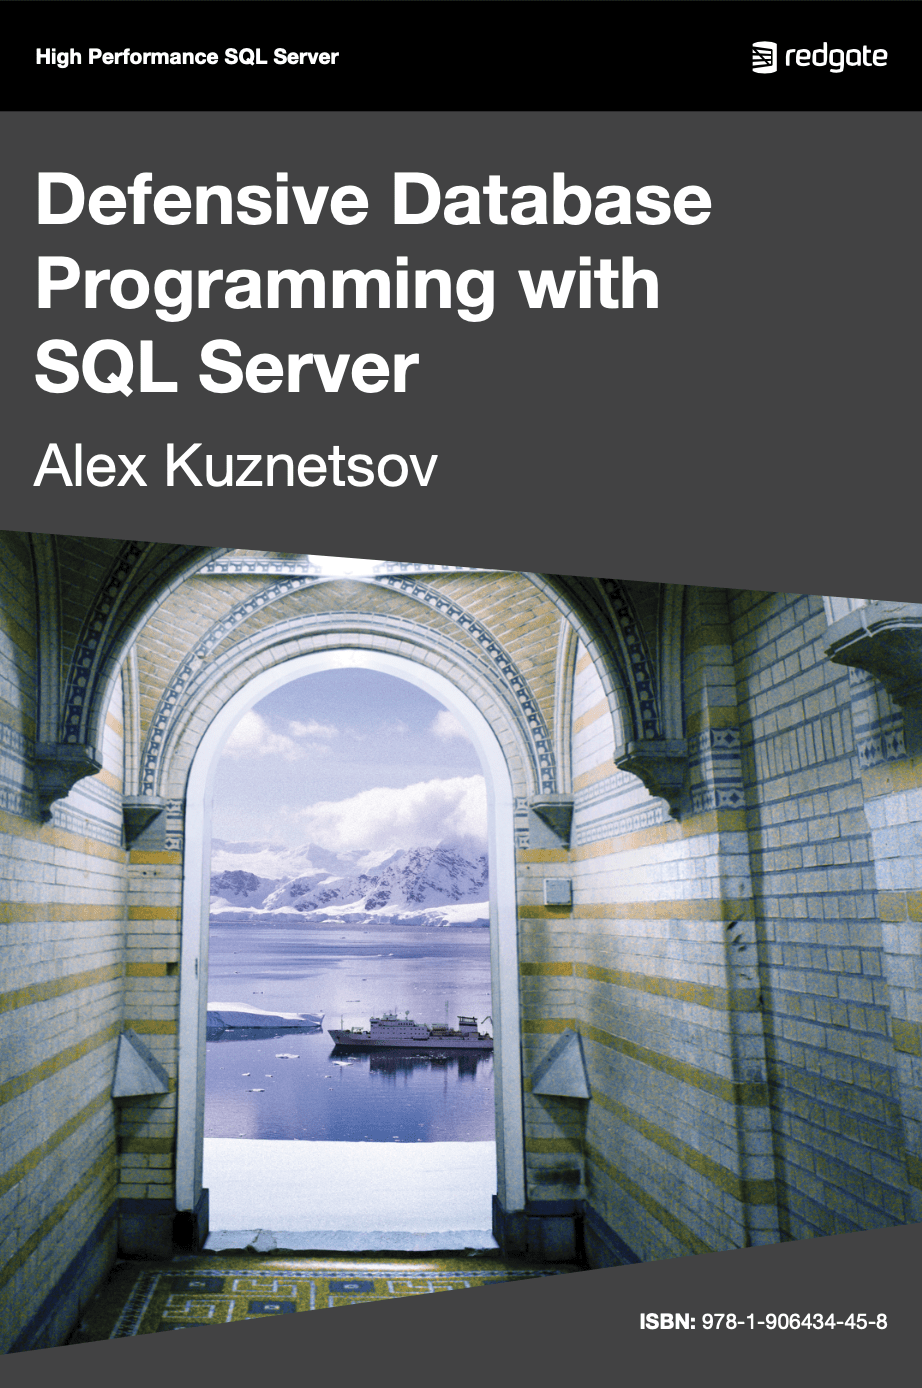 Defensive Database Programming with SQL Server eBook cover